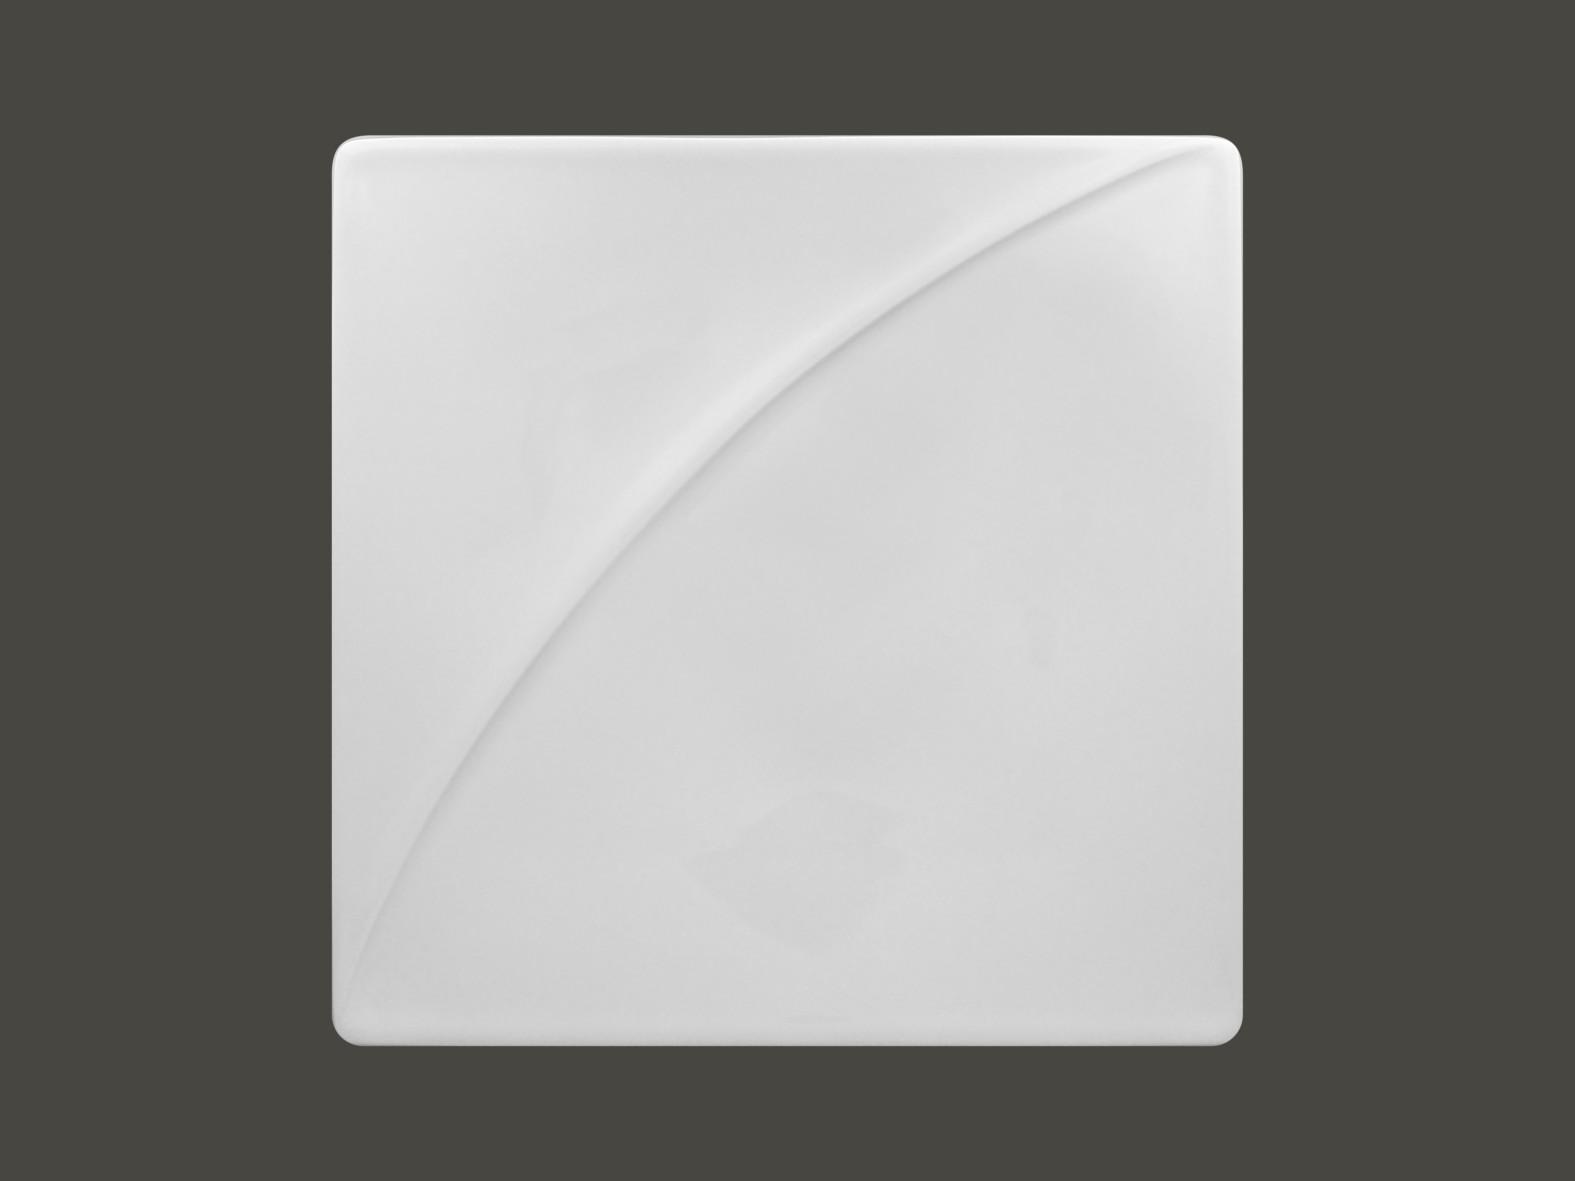 Moon talíř čtvercový 24×24 cm